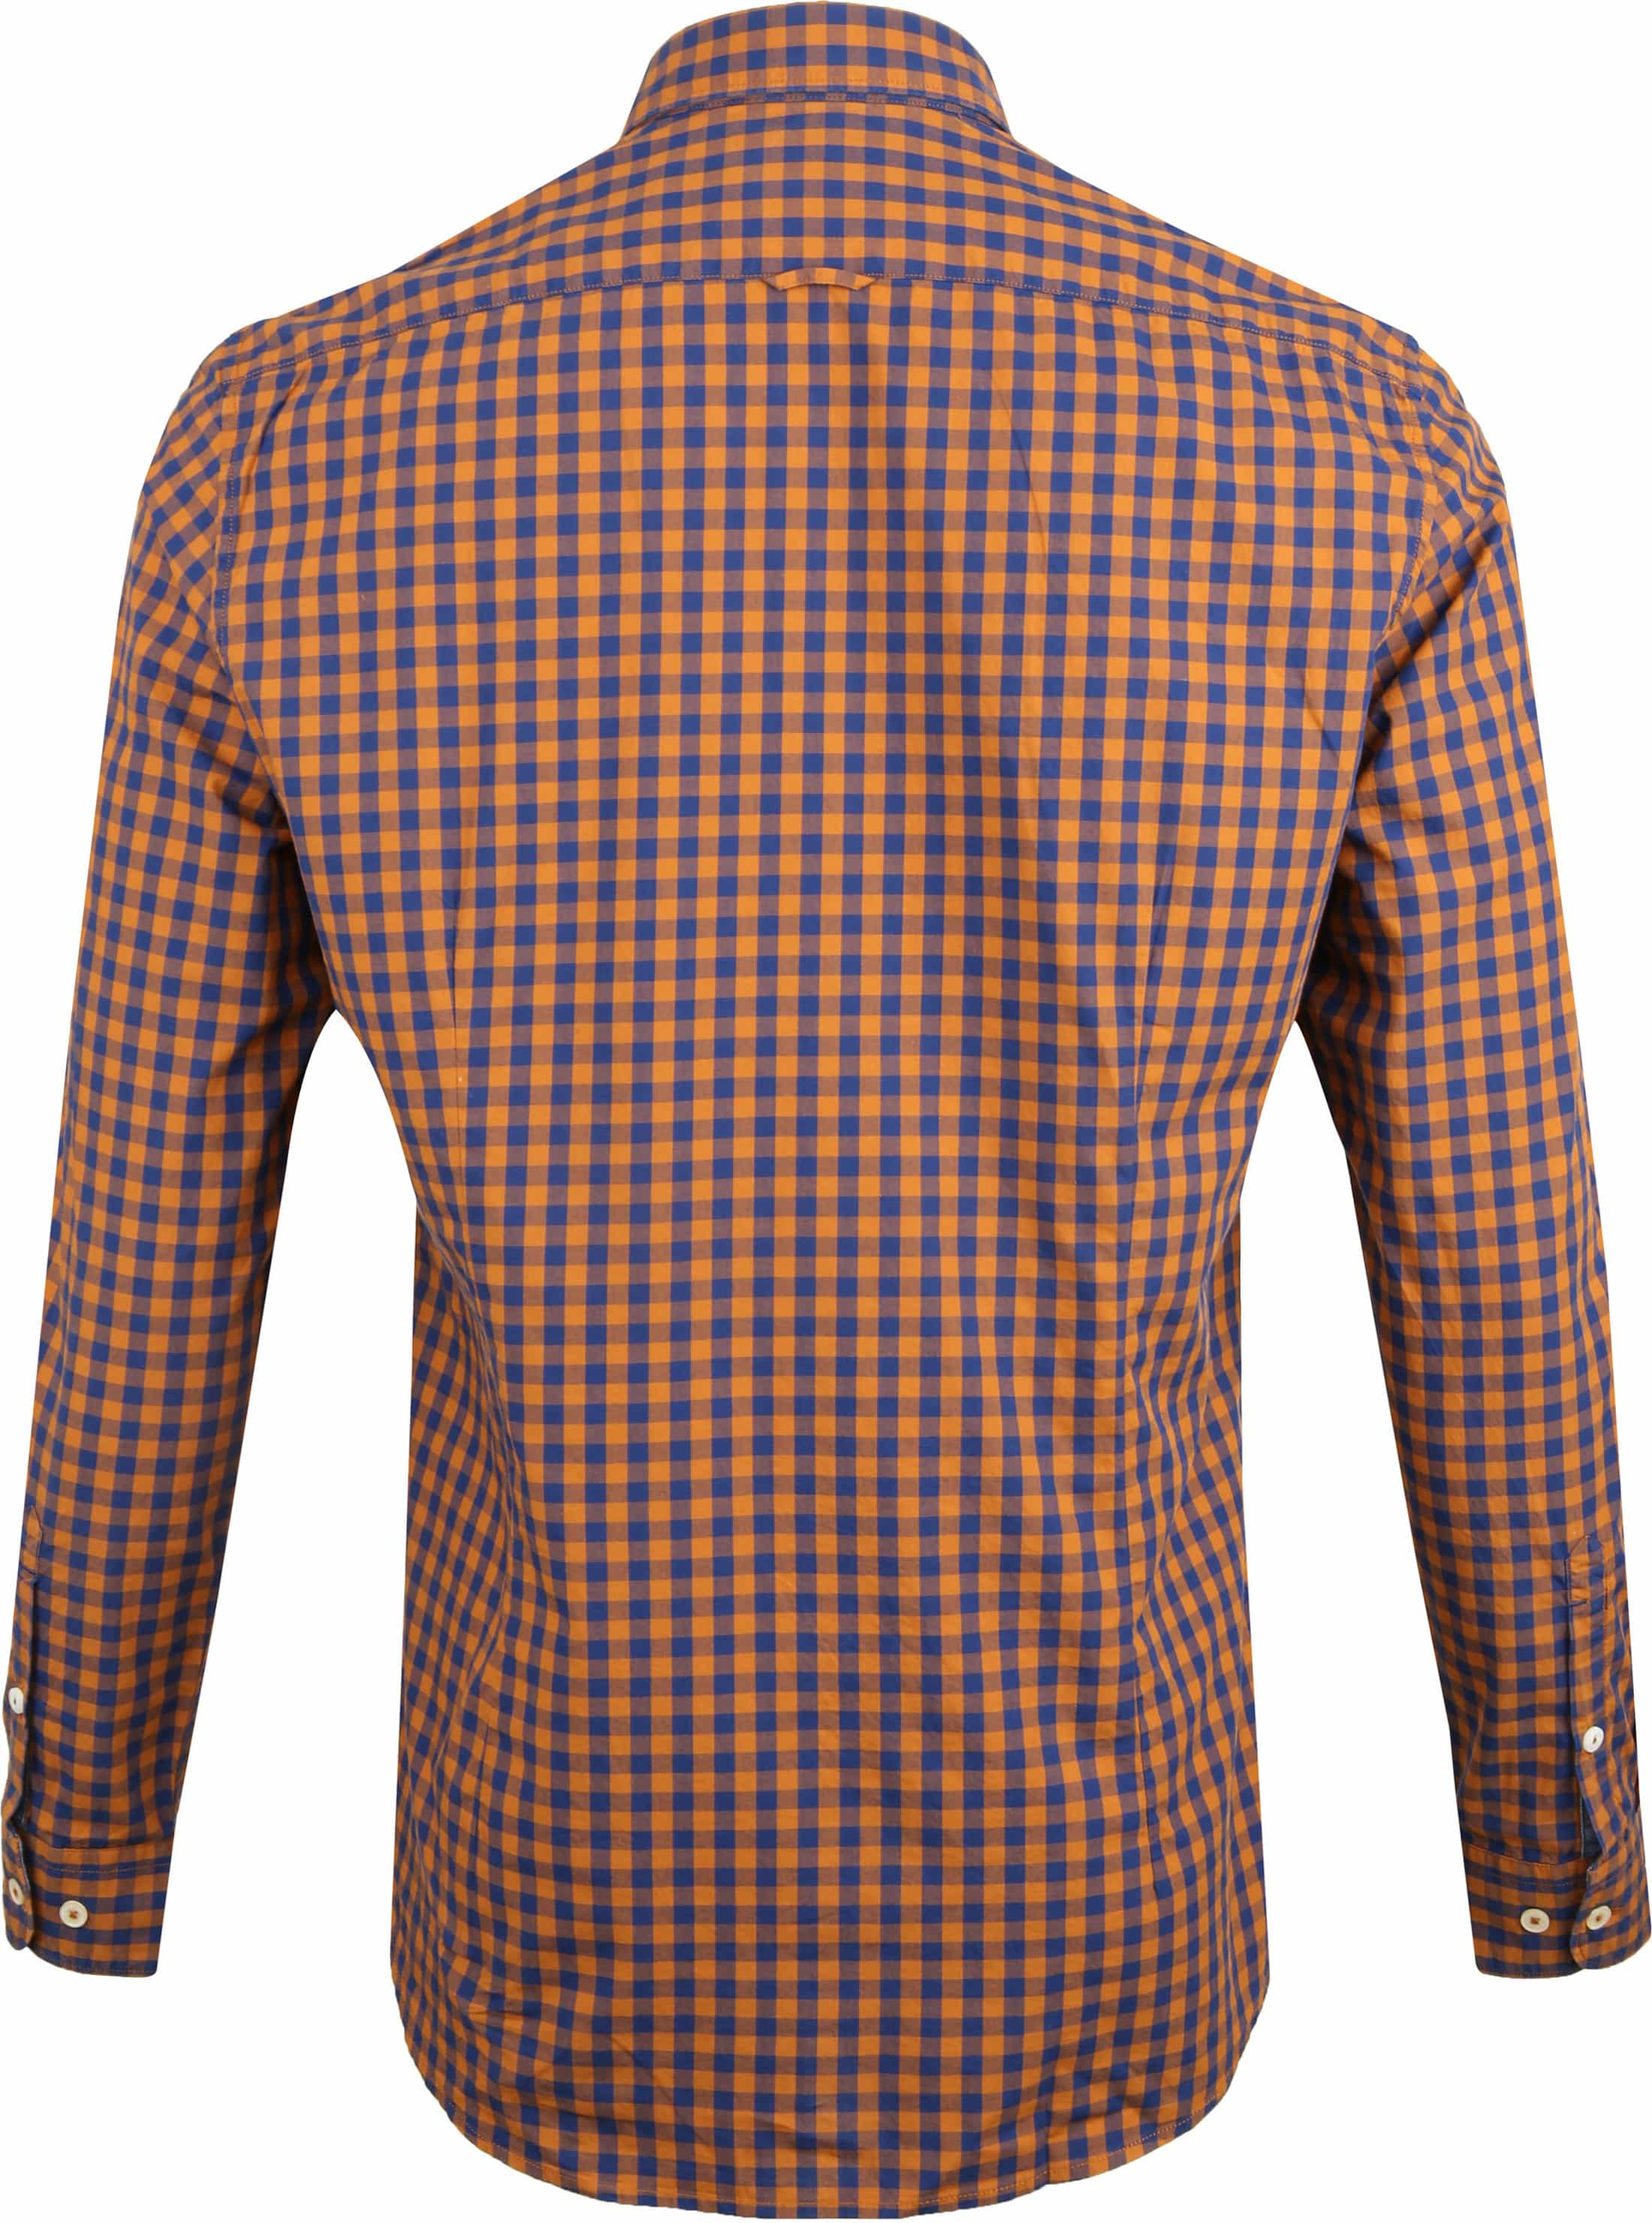 Marc O'Polo Overhemd Ruiten Oranje foto 3